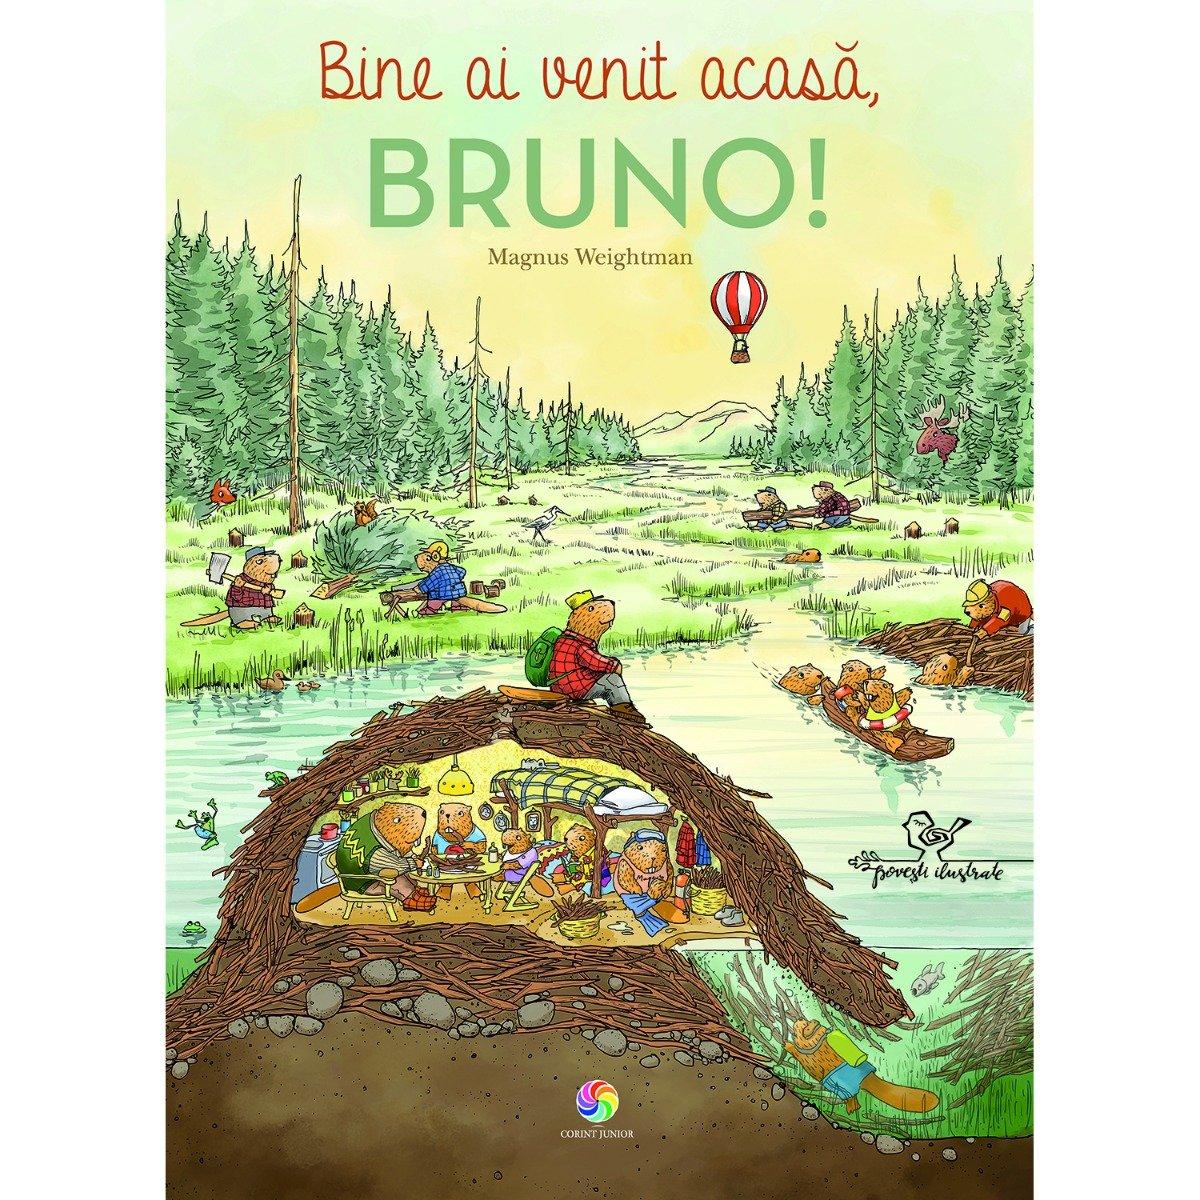 Carte Editura Corint, Bine ai venit acasa, Bruno!, Magnus Weightman